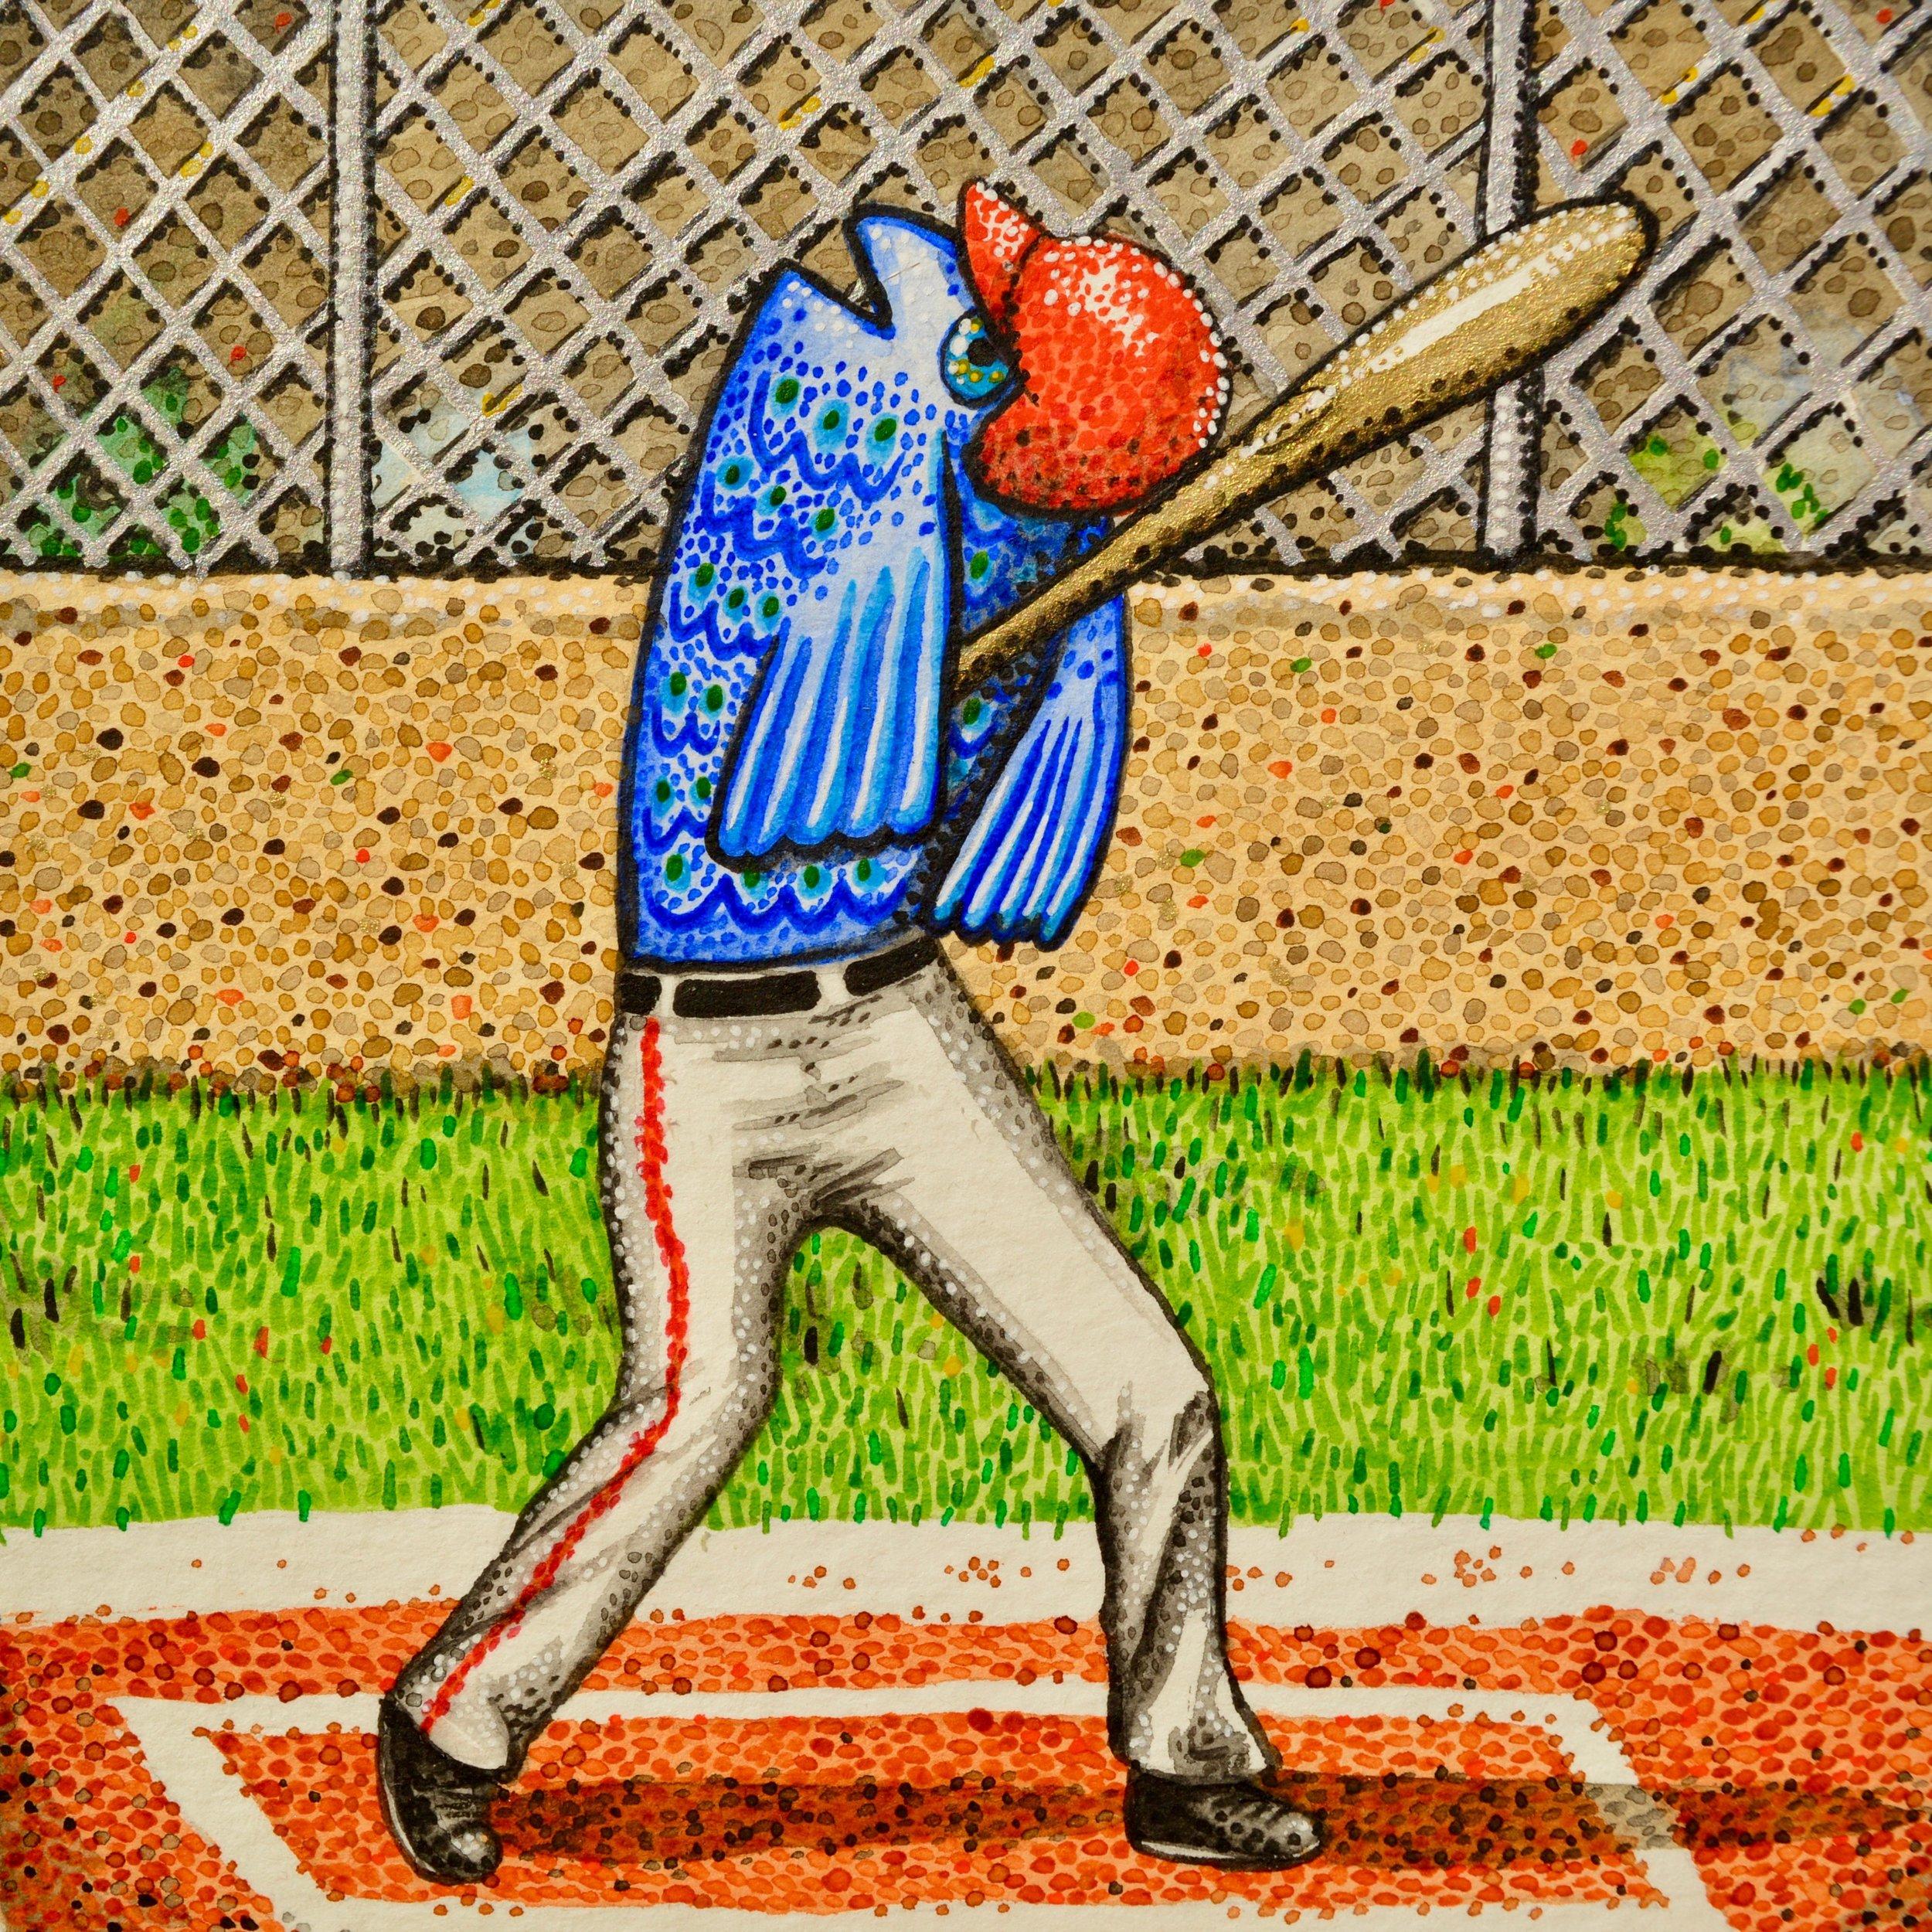 """El Pez está Jugando al Béisbol"" ( Commission )"